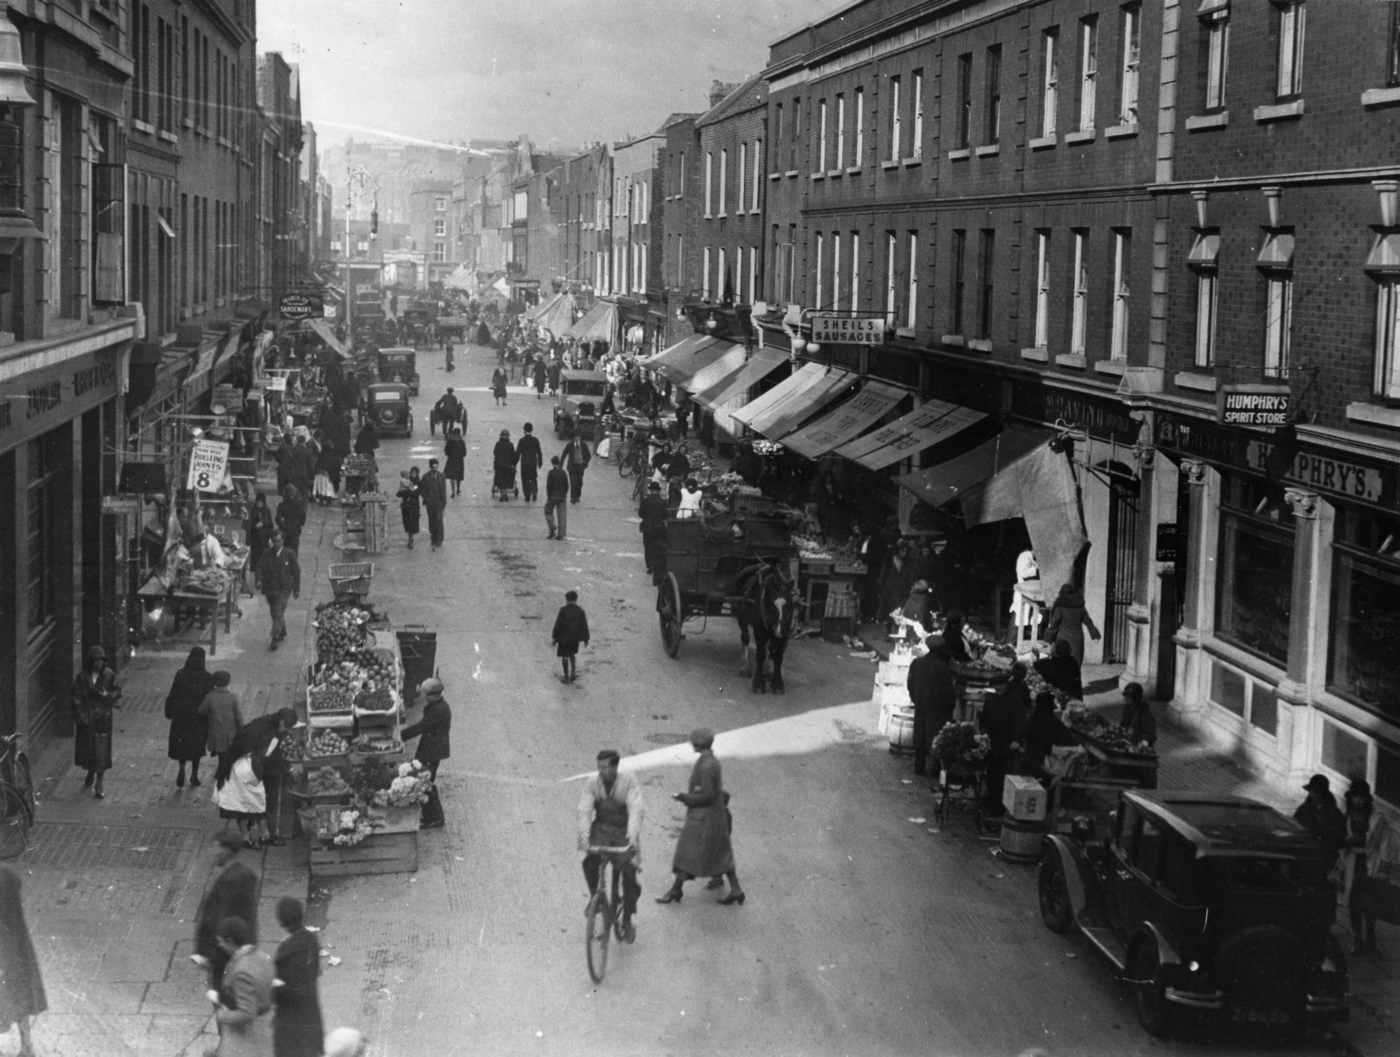 MOORE STREET, DUBLIN, C. 1930